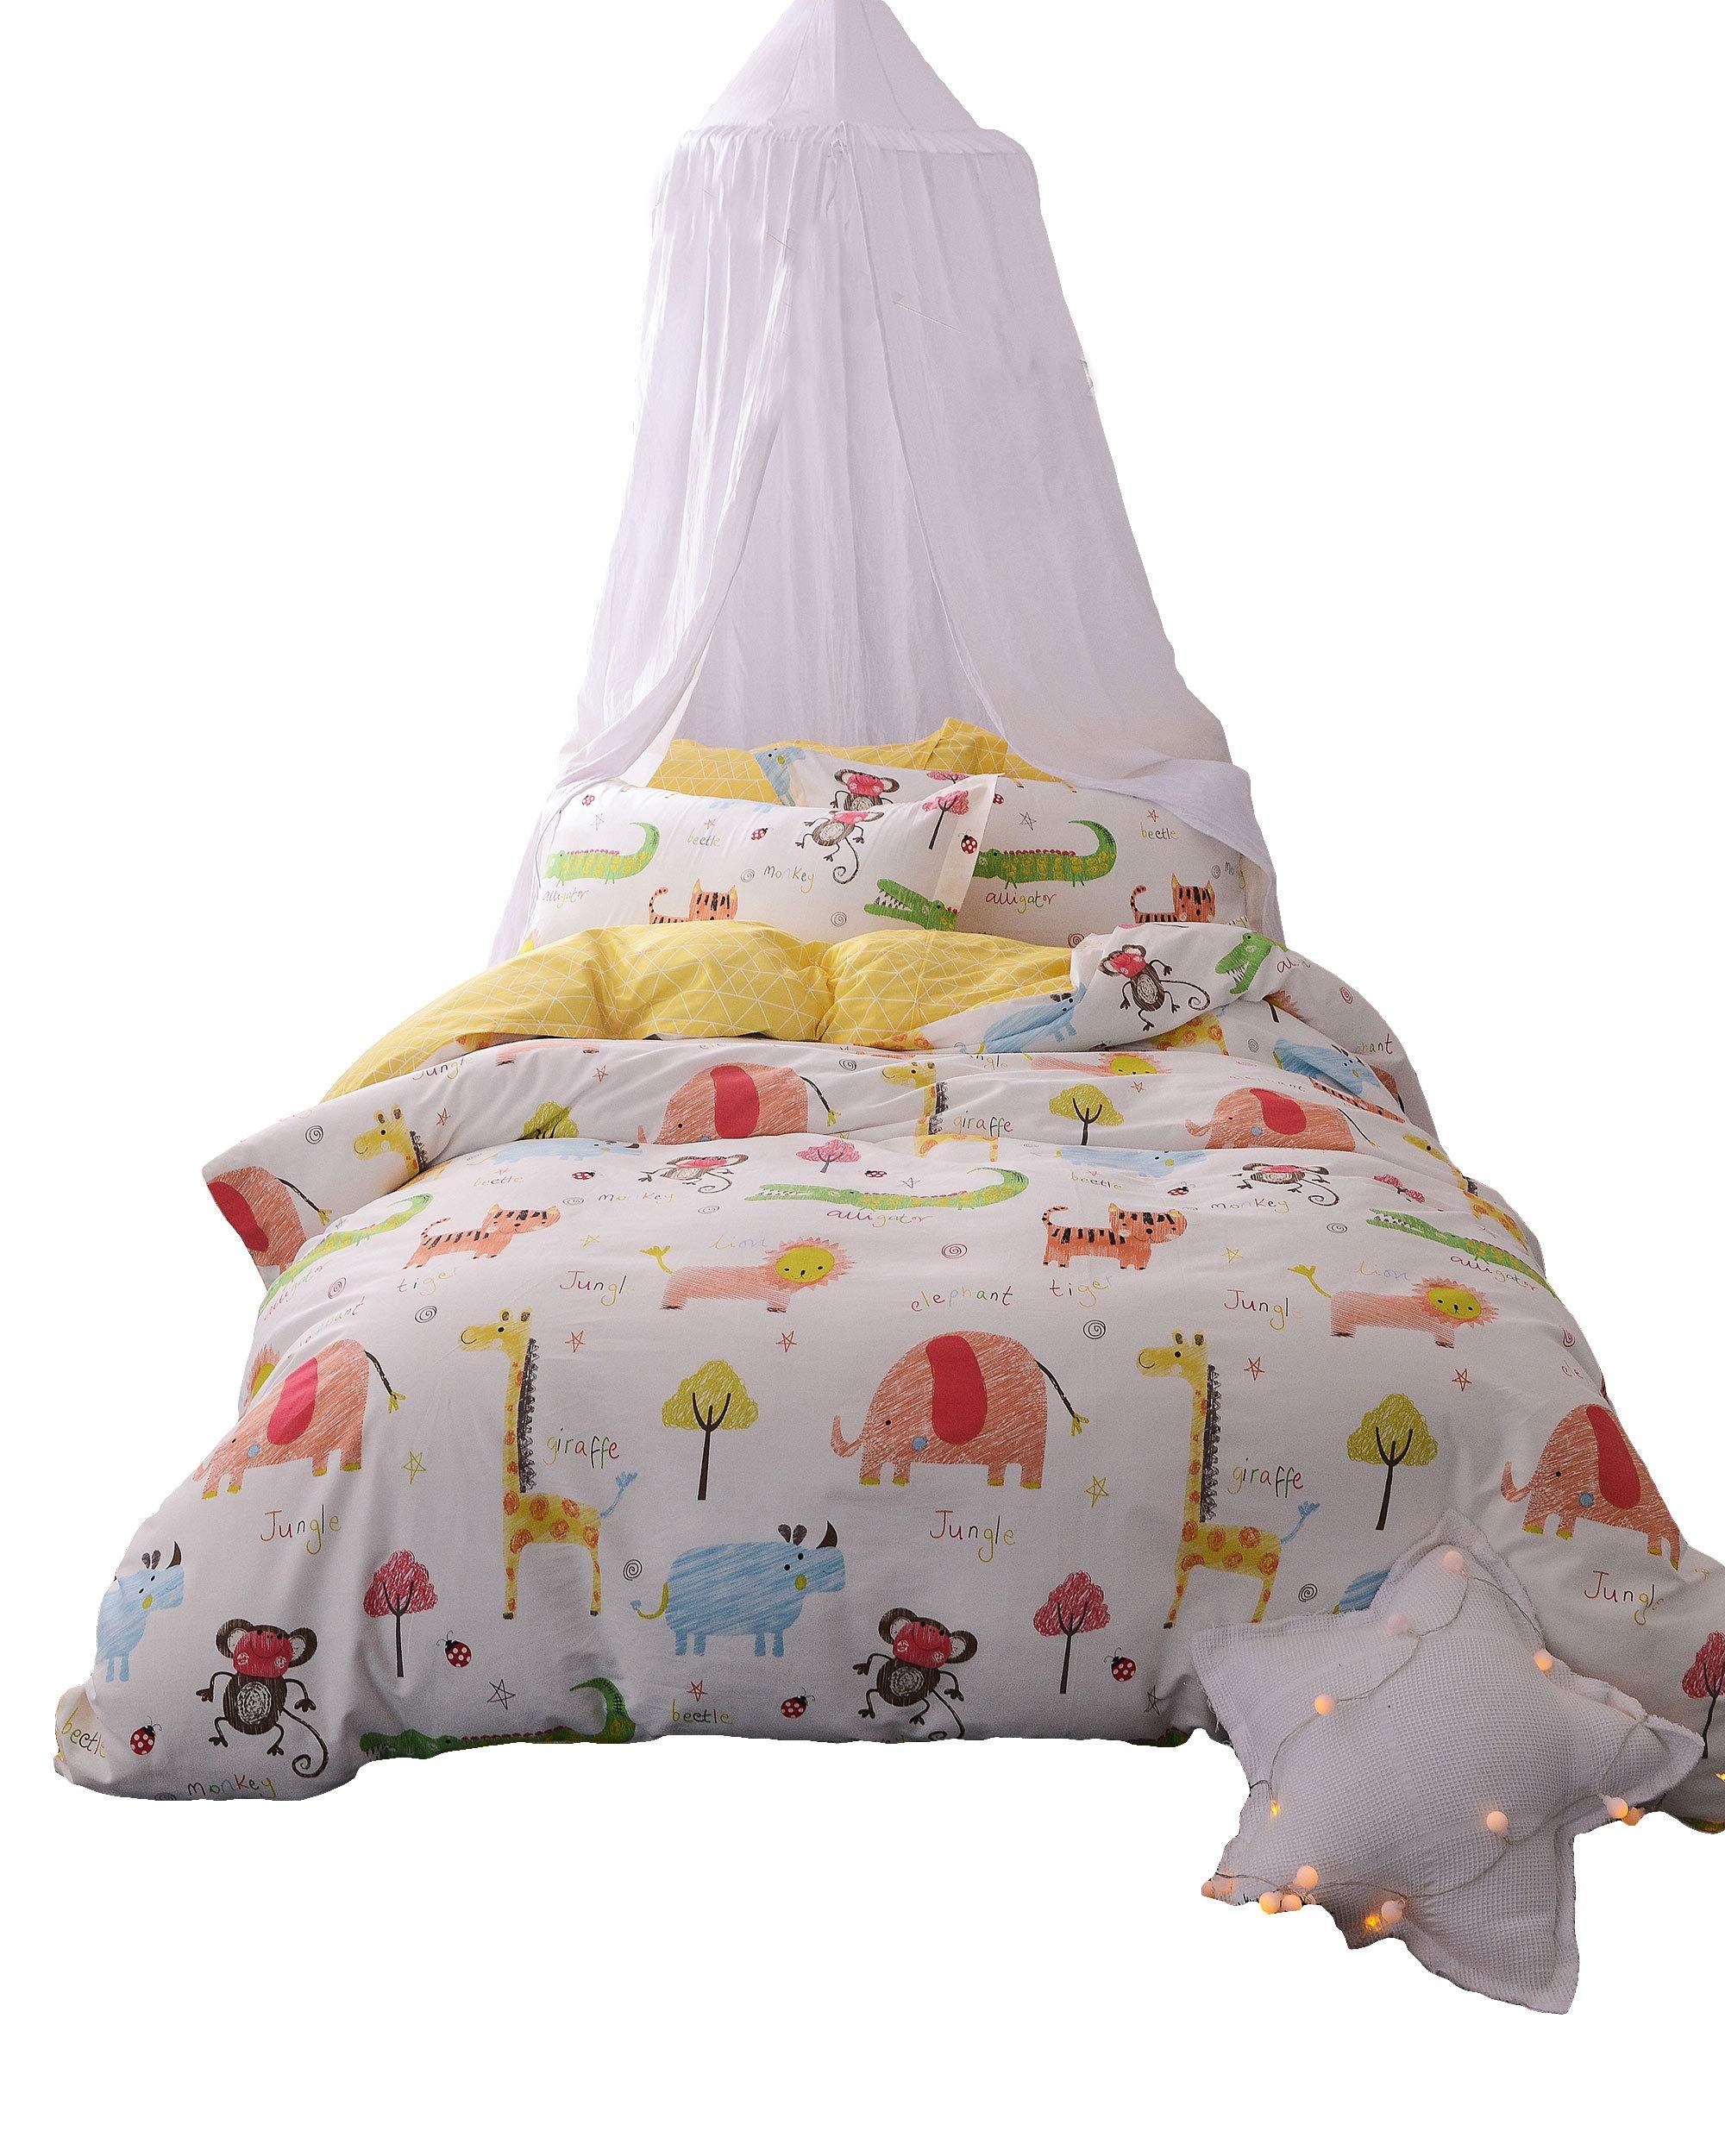 Papa&Mima Animals Zoo Cute Brief Cartoon Style Duvet Cover Set Flat Sheet Pillow Cases 500TC Soft Cotton Fabric 3Pcs Twin Size Bedding Sets